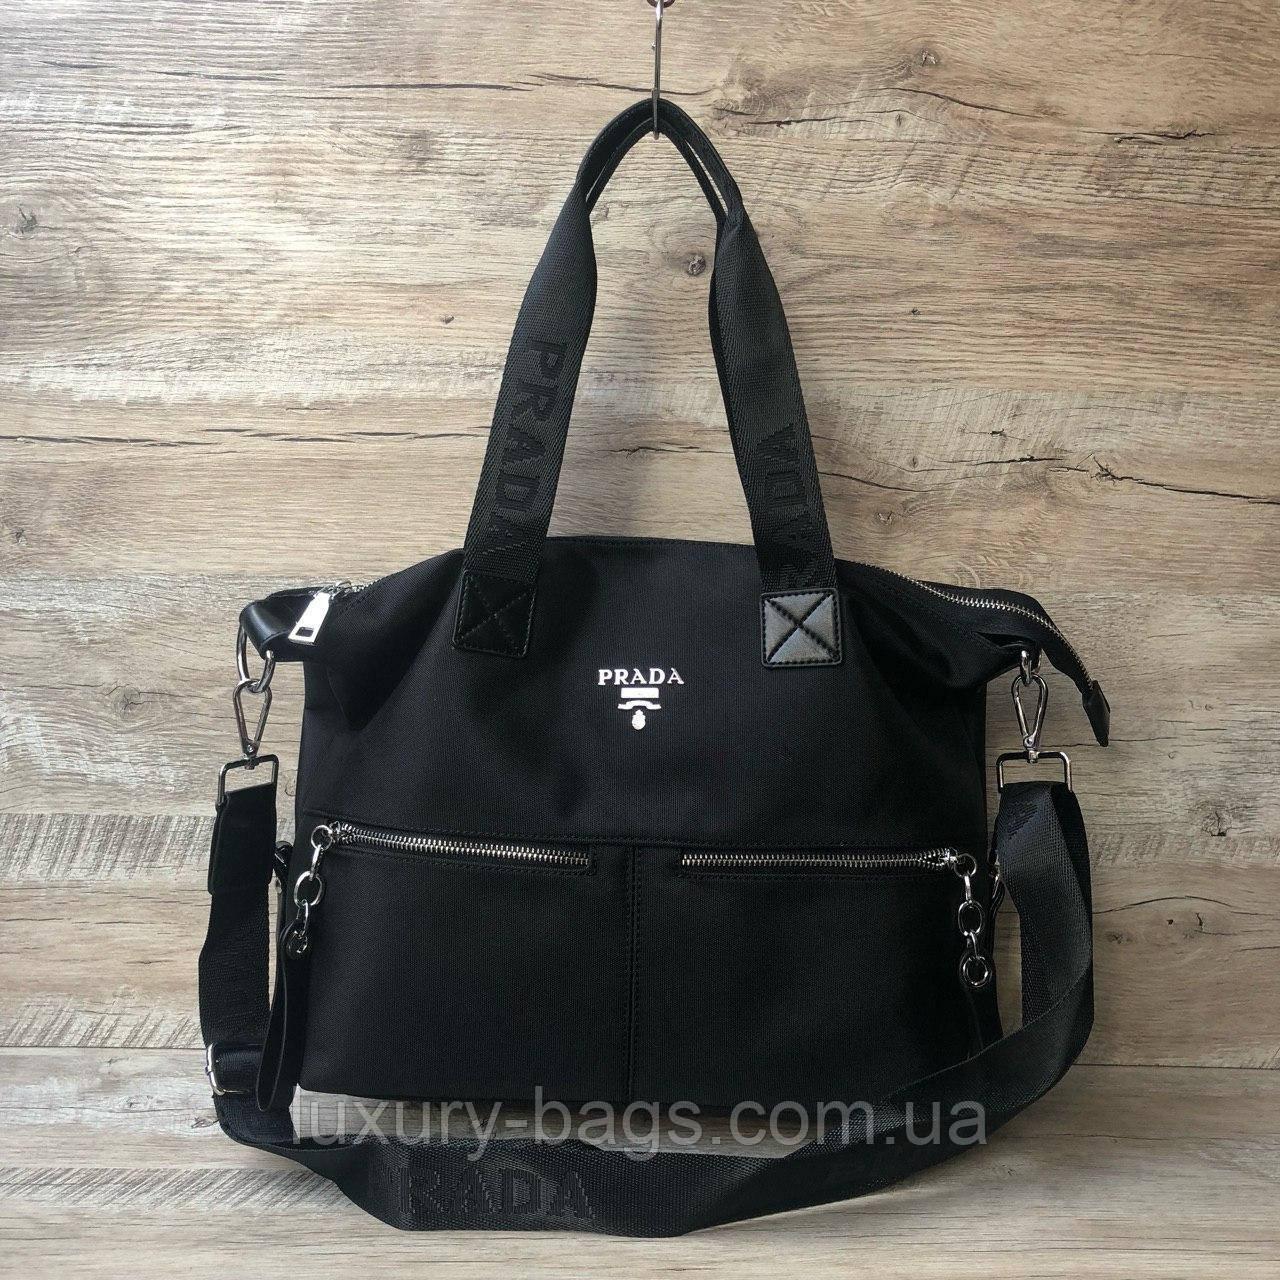 Жіноча текстильна сумка Прада